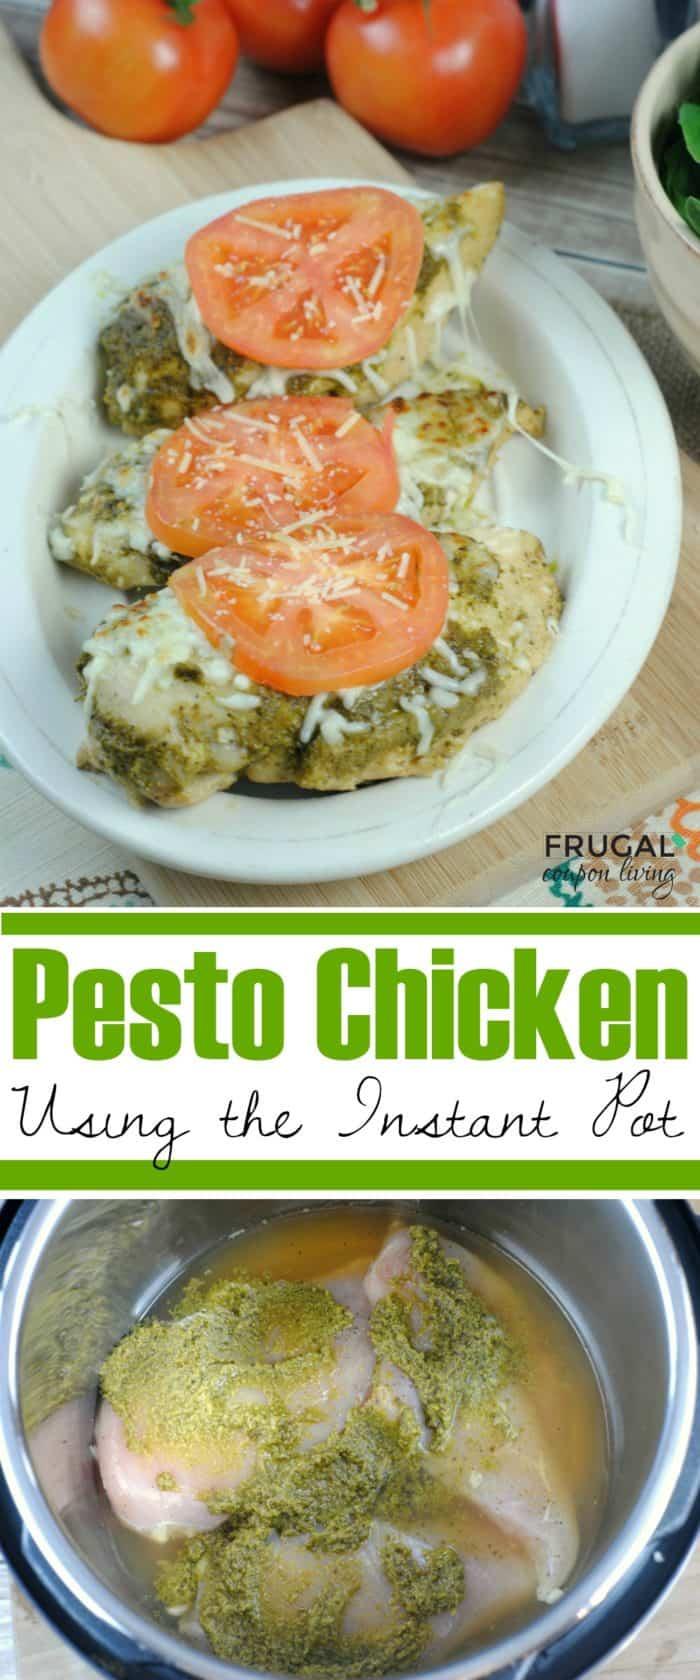 Instant Pot Pesto Chicken Recipe